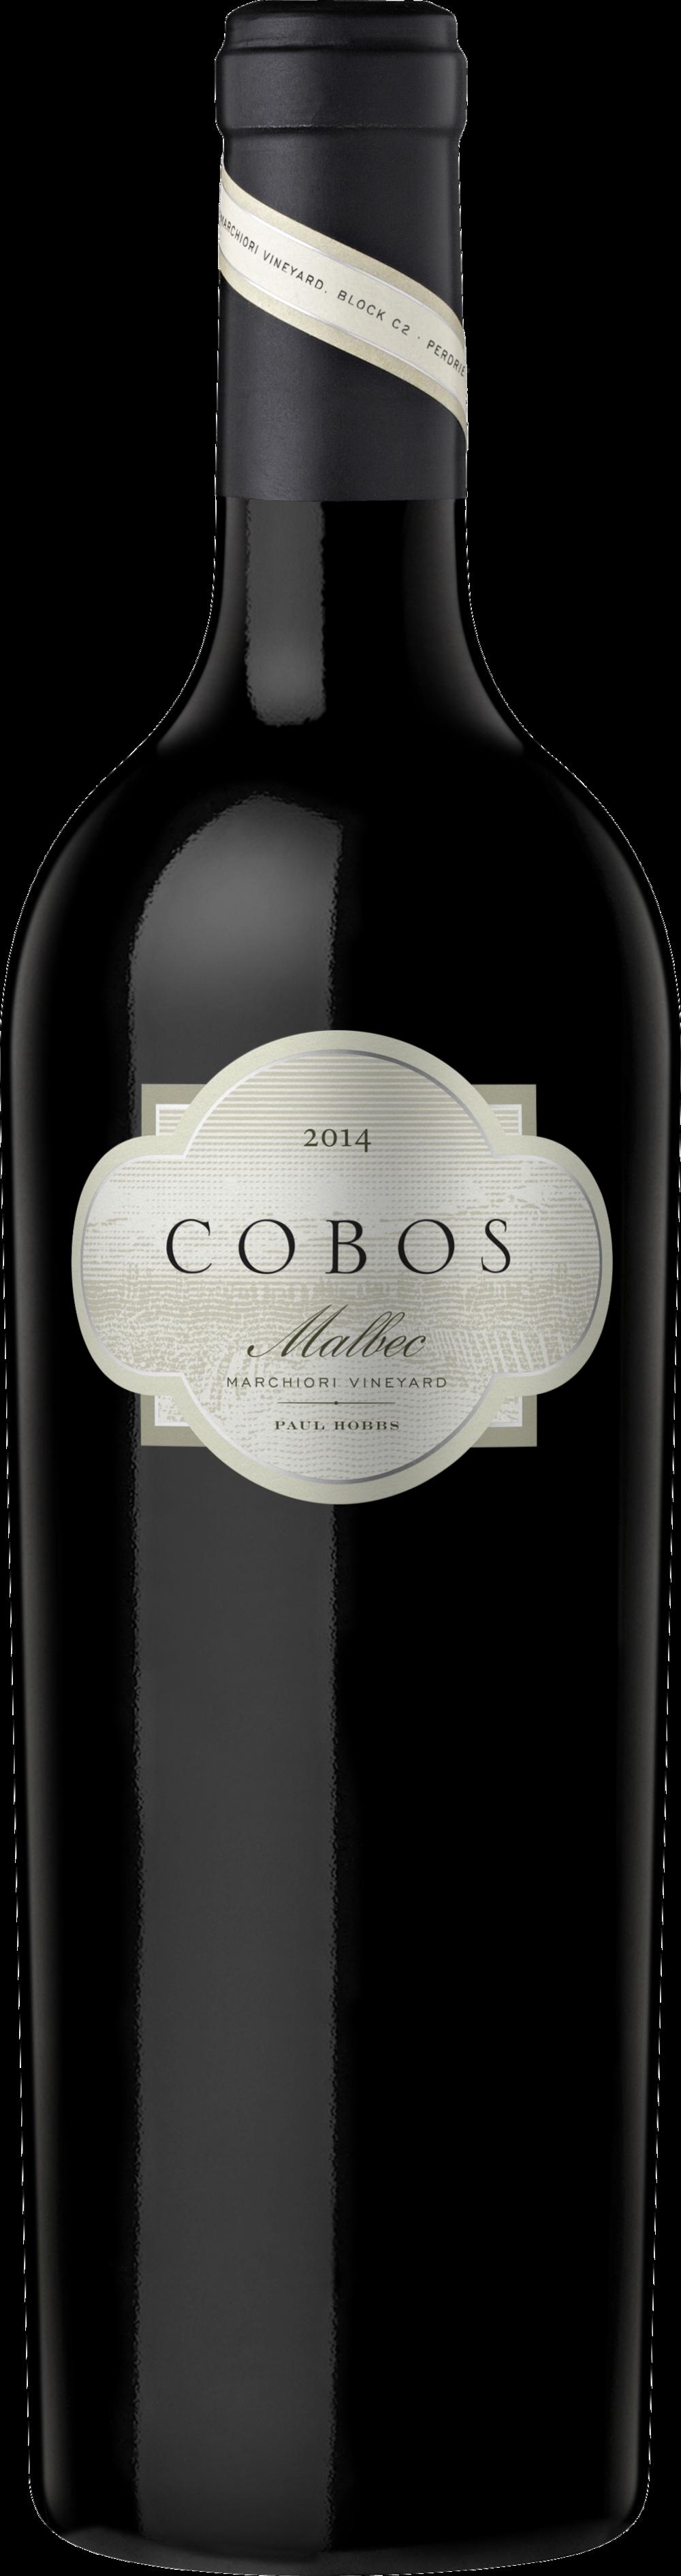 Cobos Malbec Argentine wine